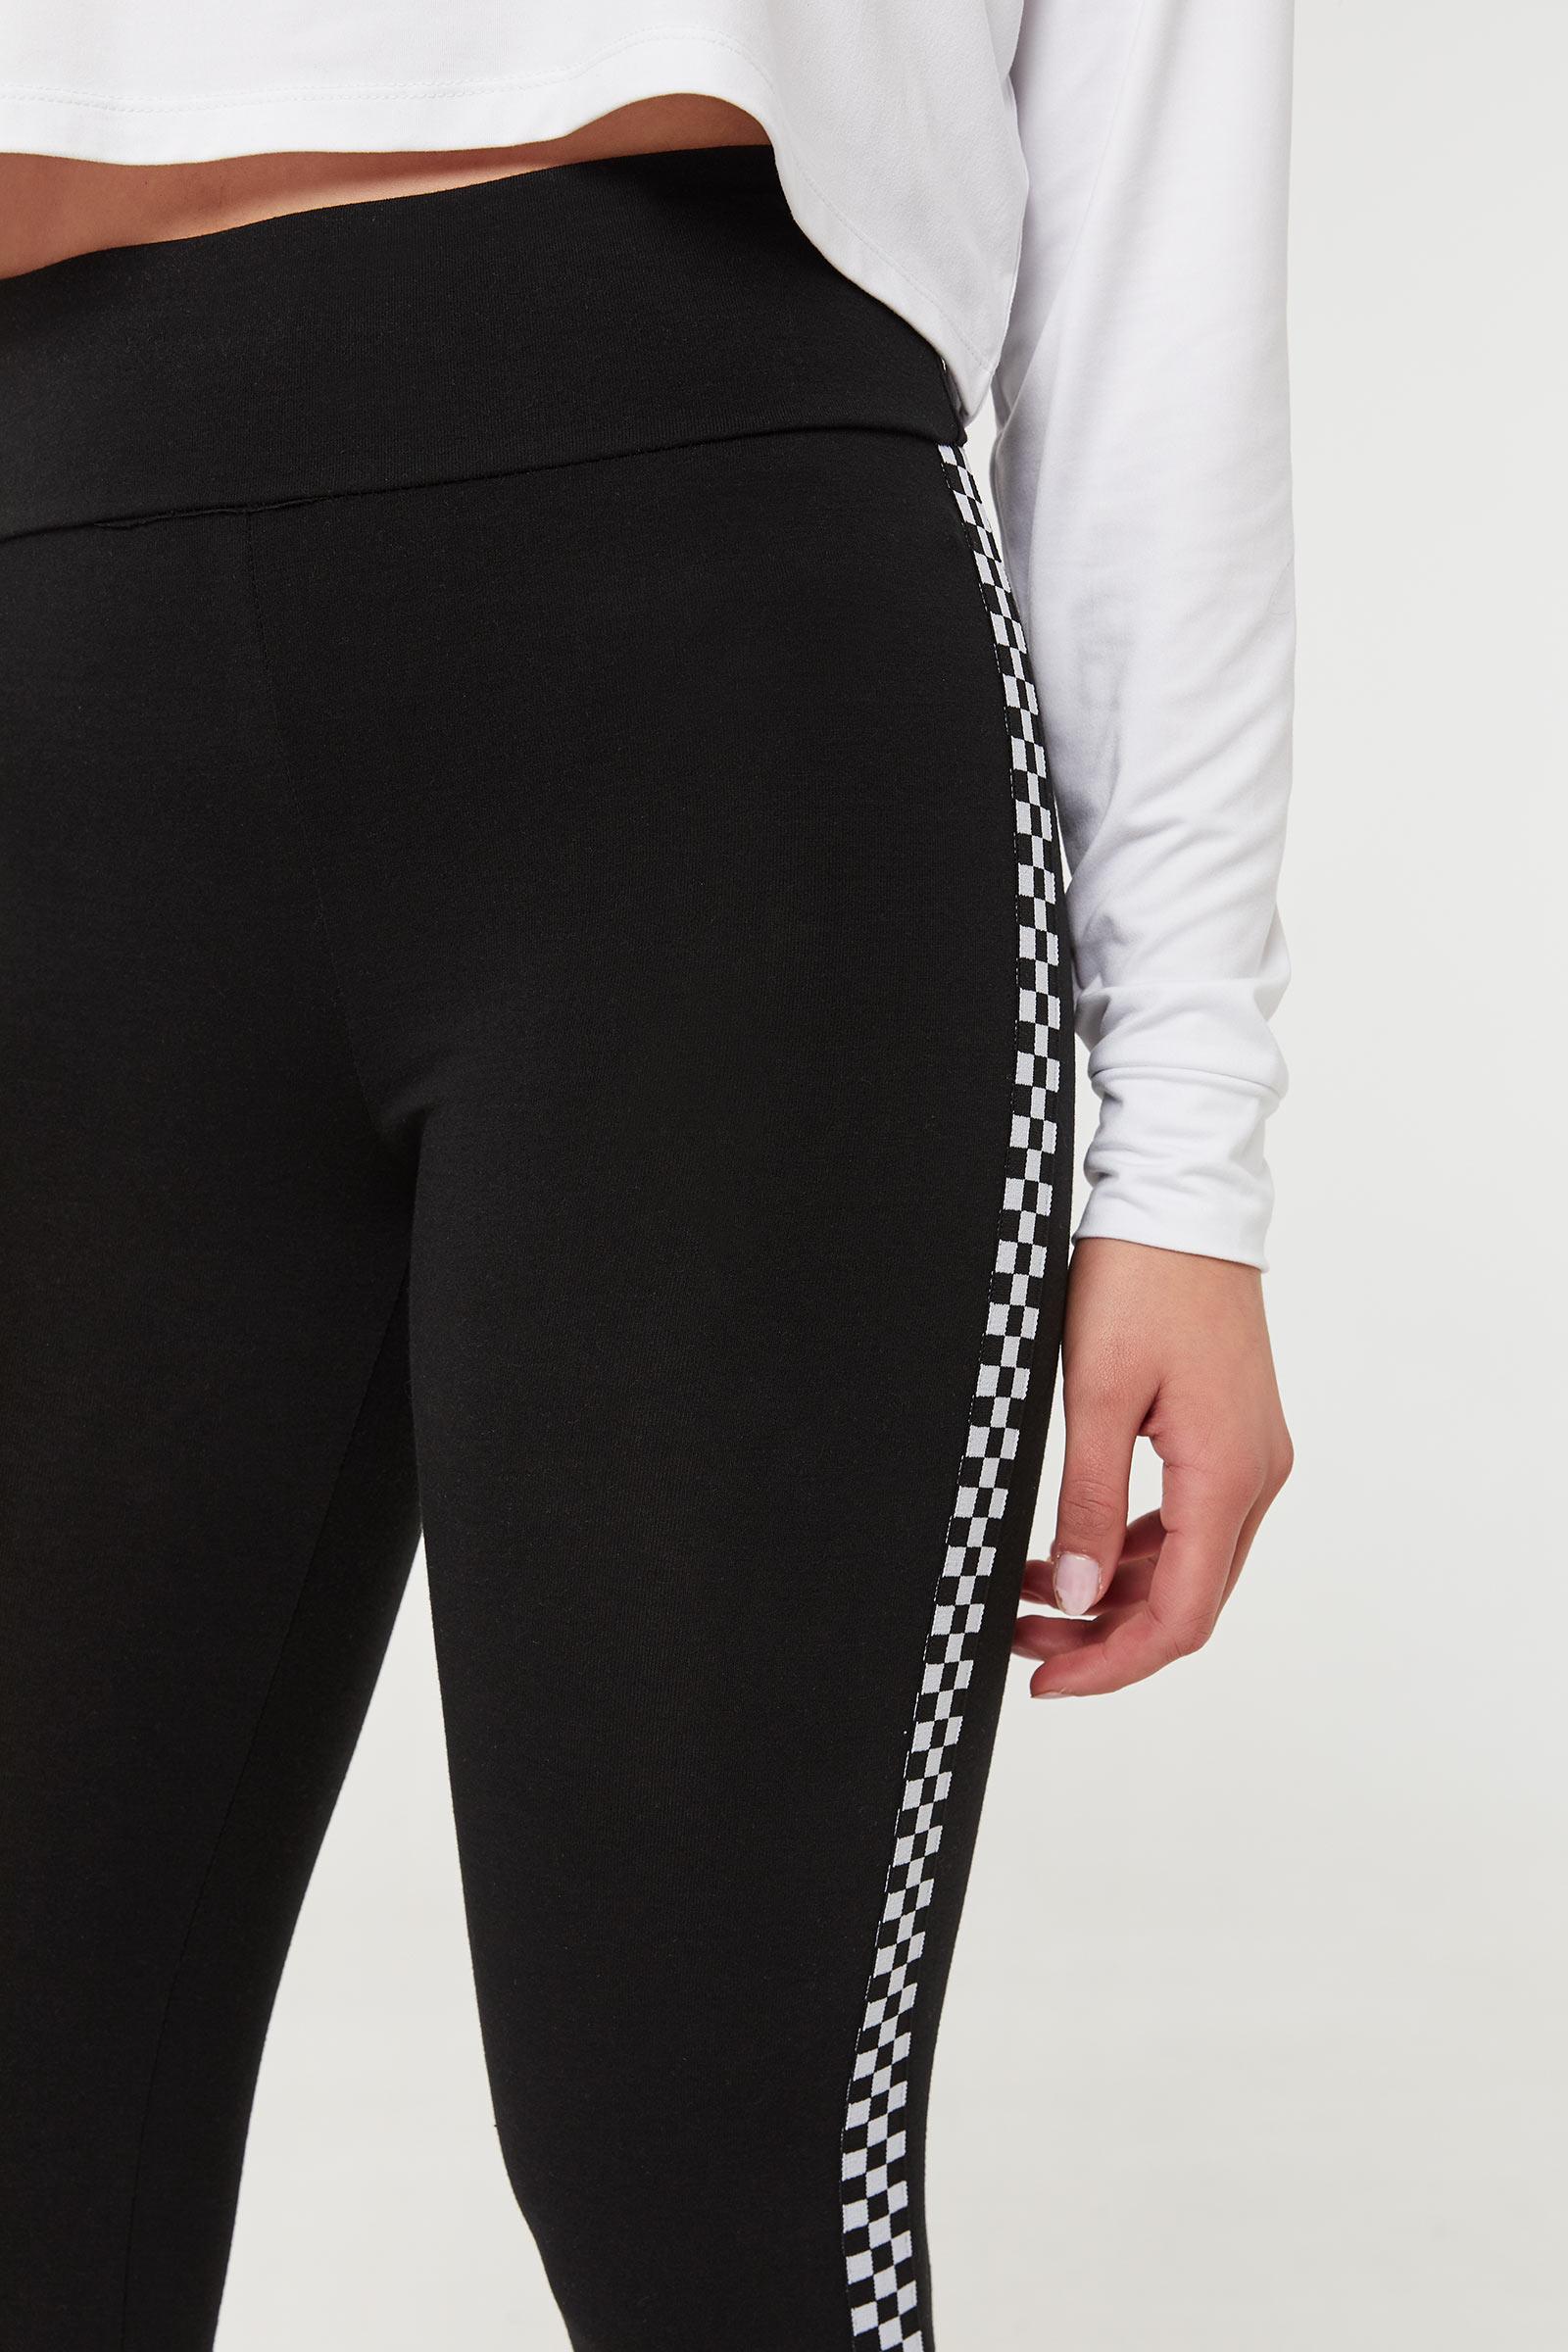 Checkerboard Print Leggings